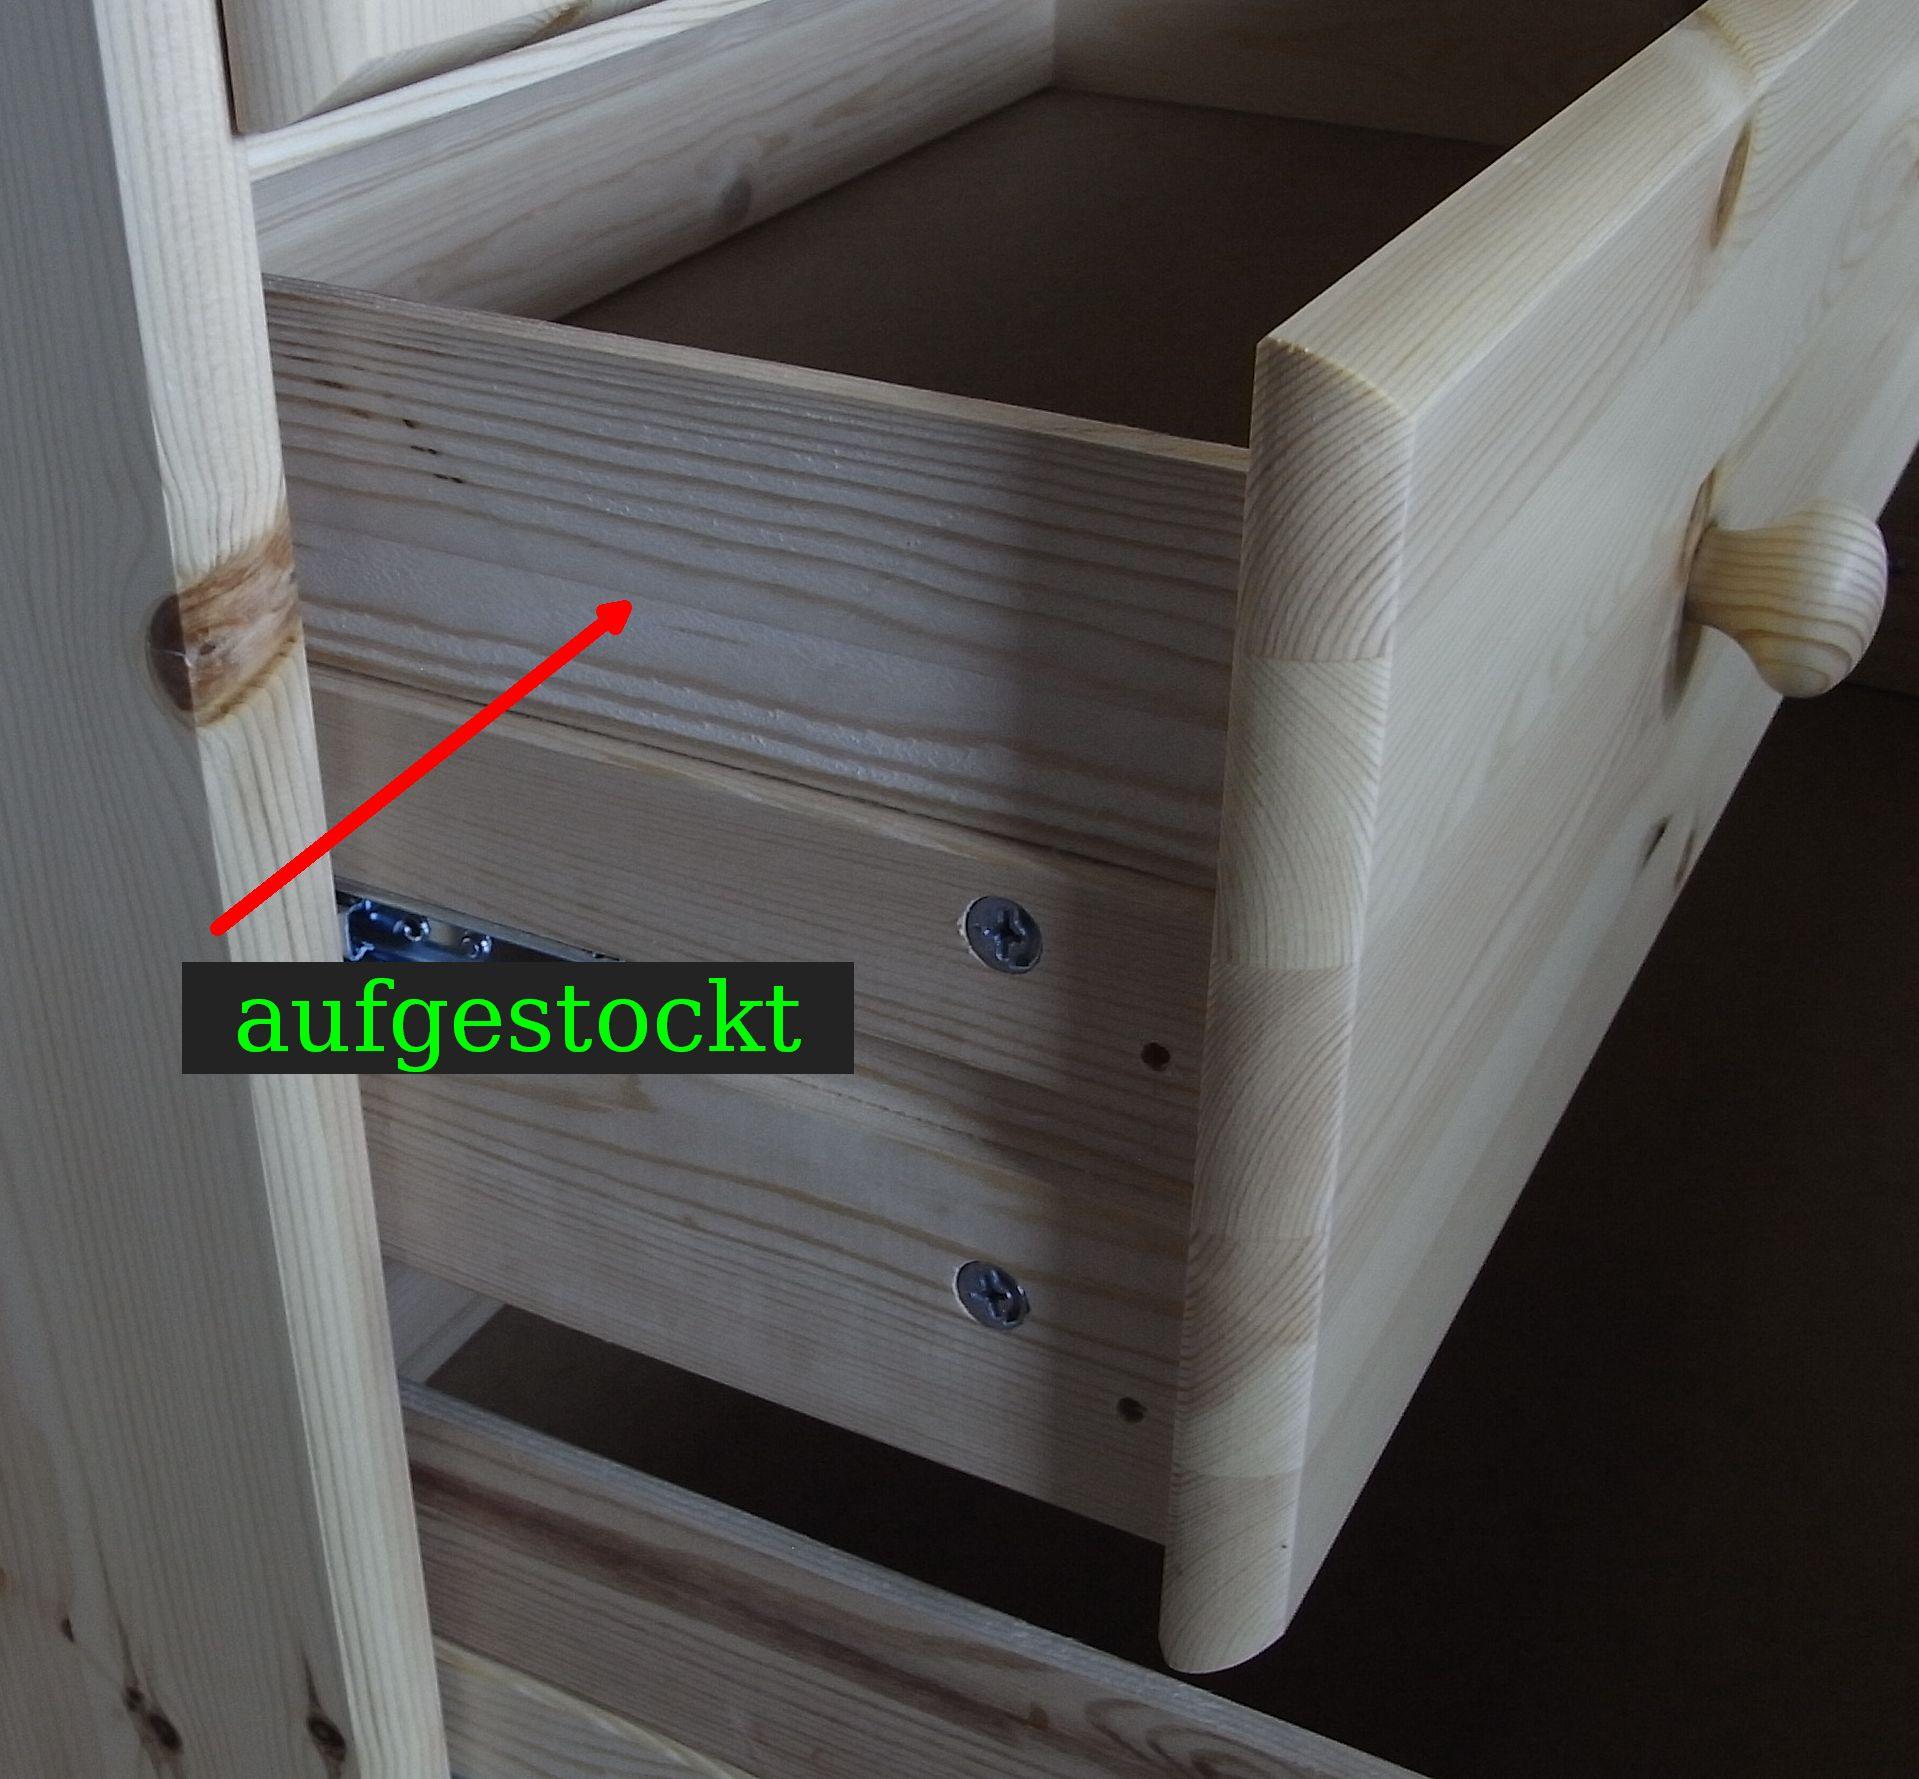 schubkasten aufgestockt. Black Bedroom Furniture Sets. Home Design Ideas